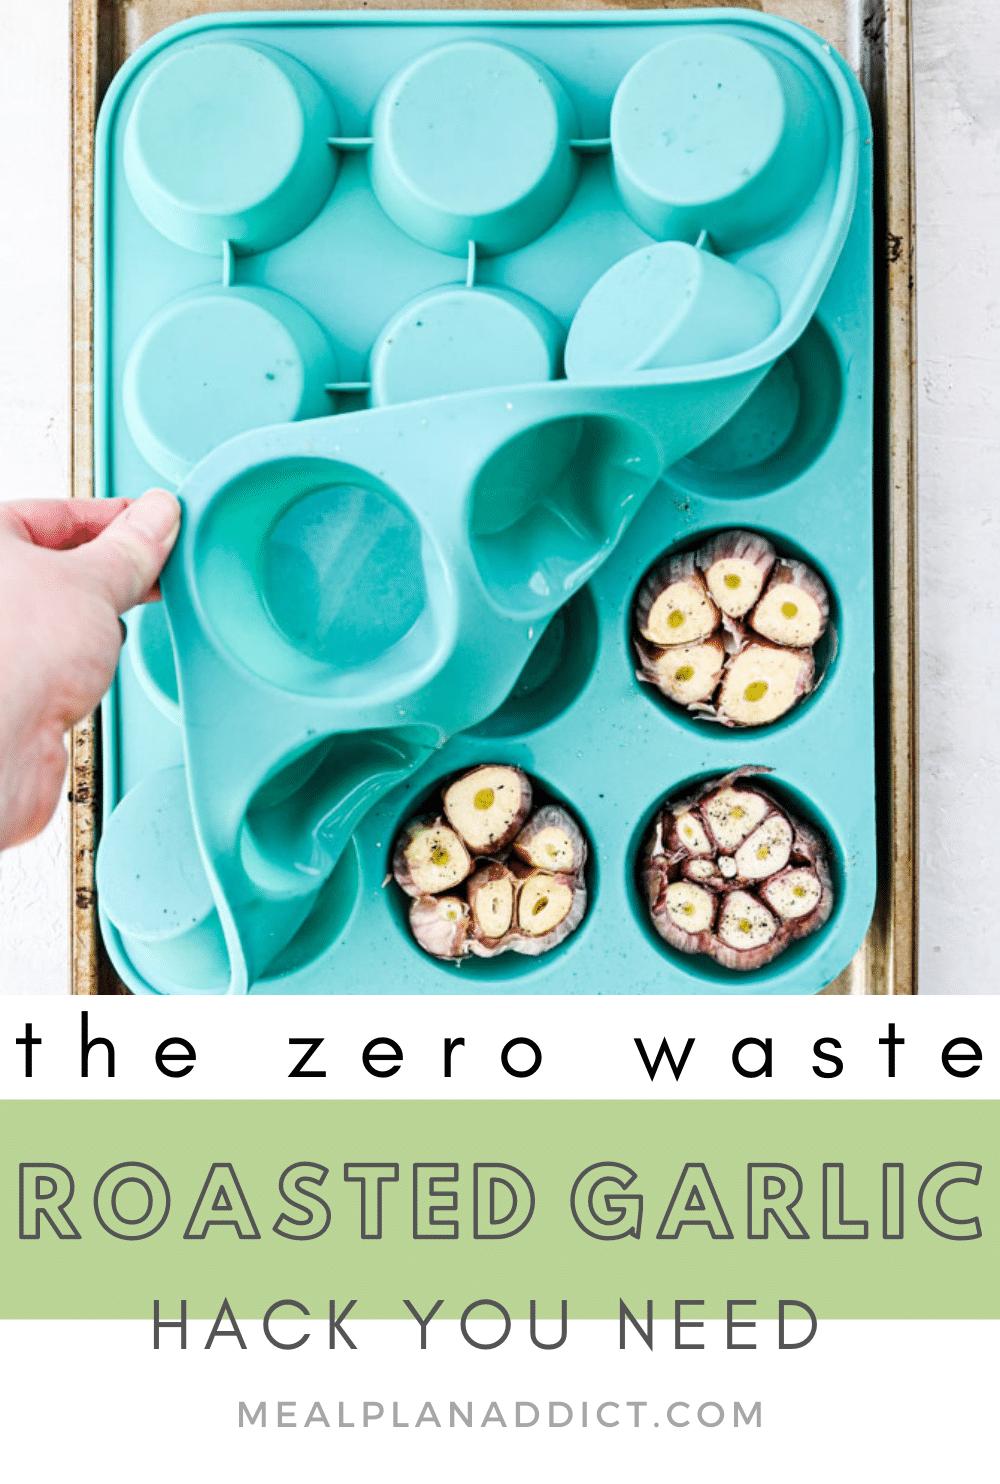 the zero waste garlic hack you need pin